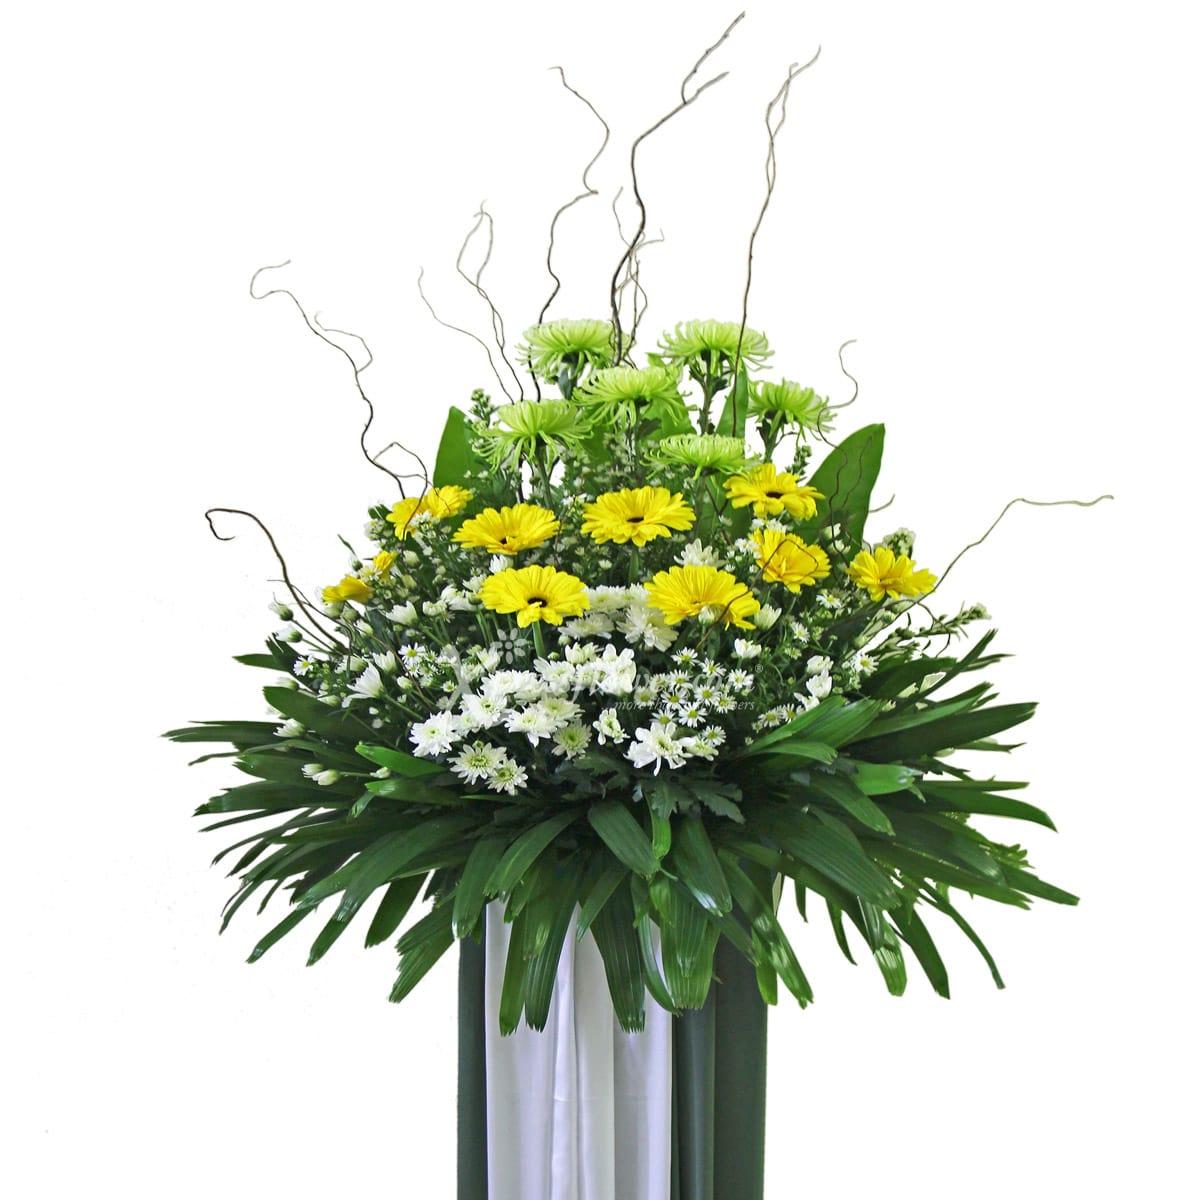 One in Harmony (Wreath)